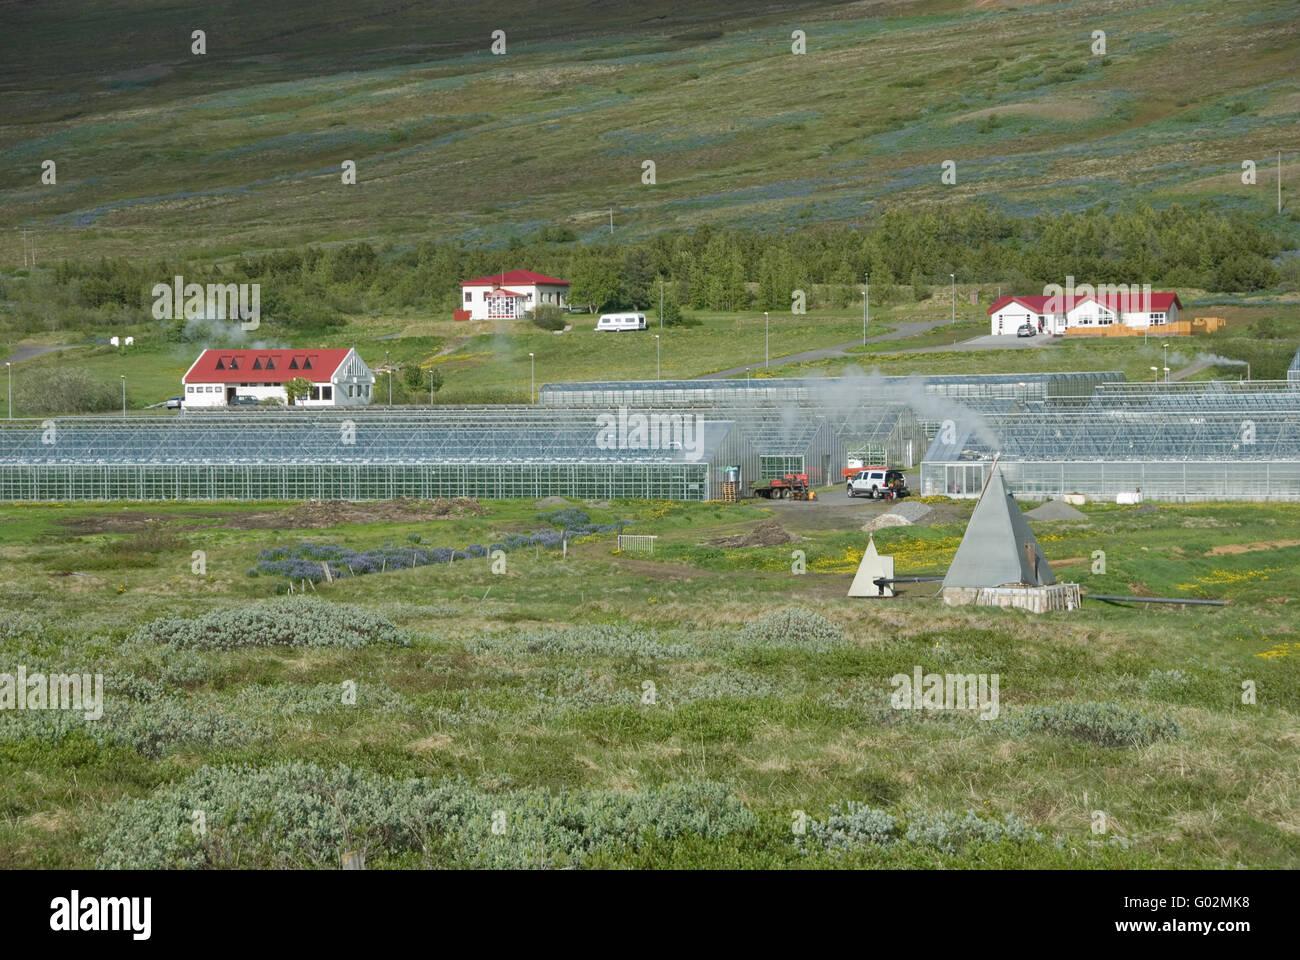 greenhouse - Stock Image